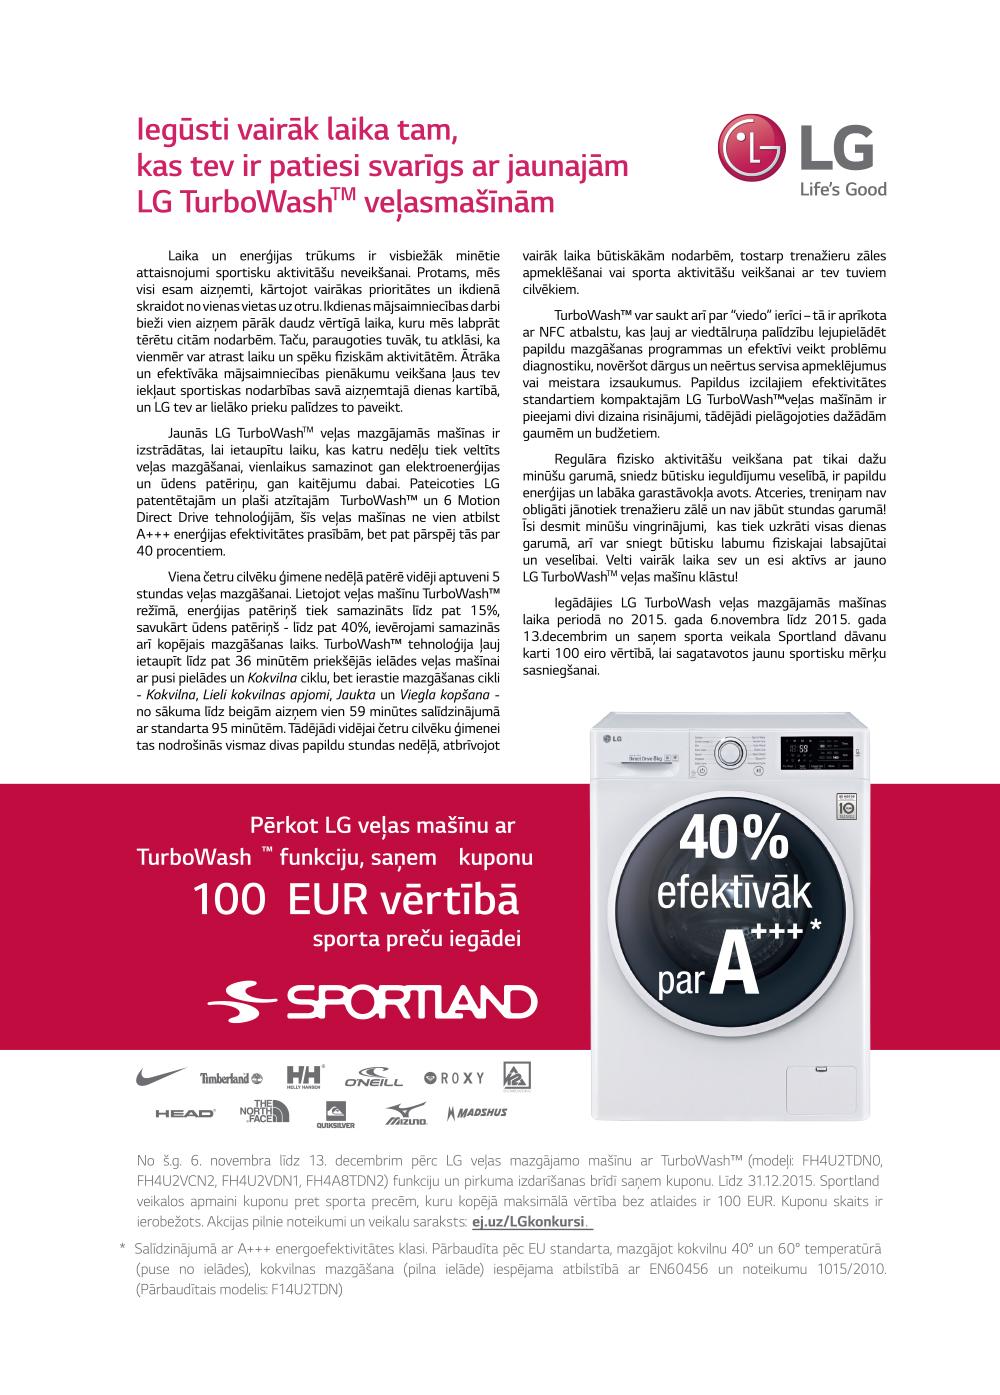 LG TurboWash Sportland Promo A4 [Oct'15] LV PRN